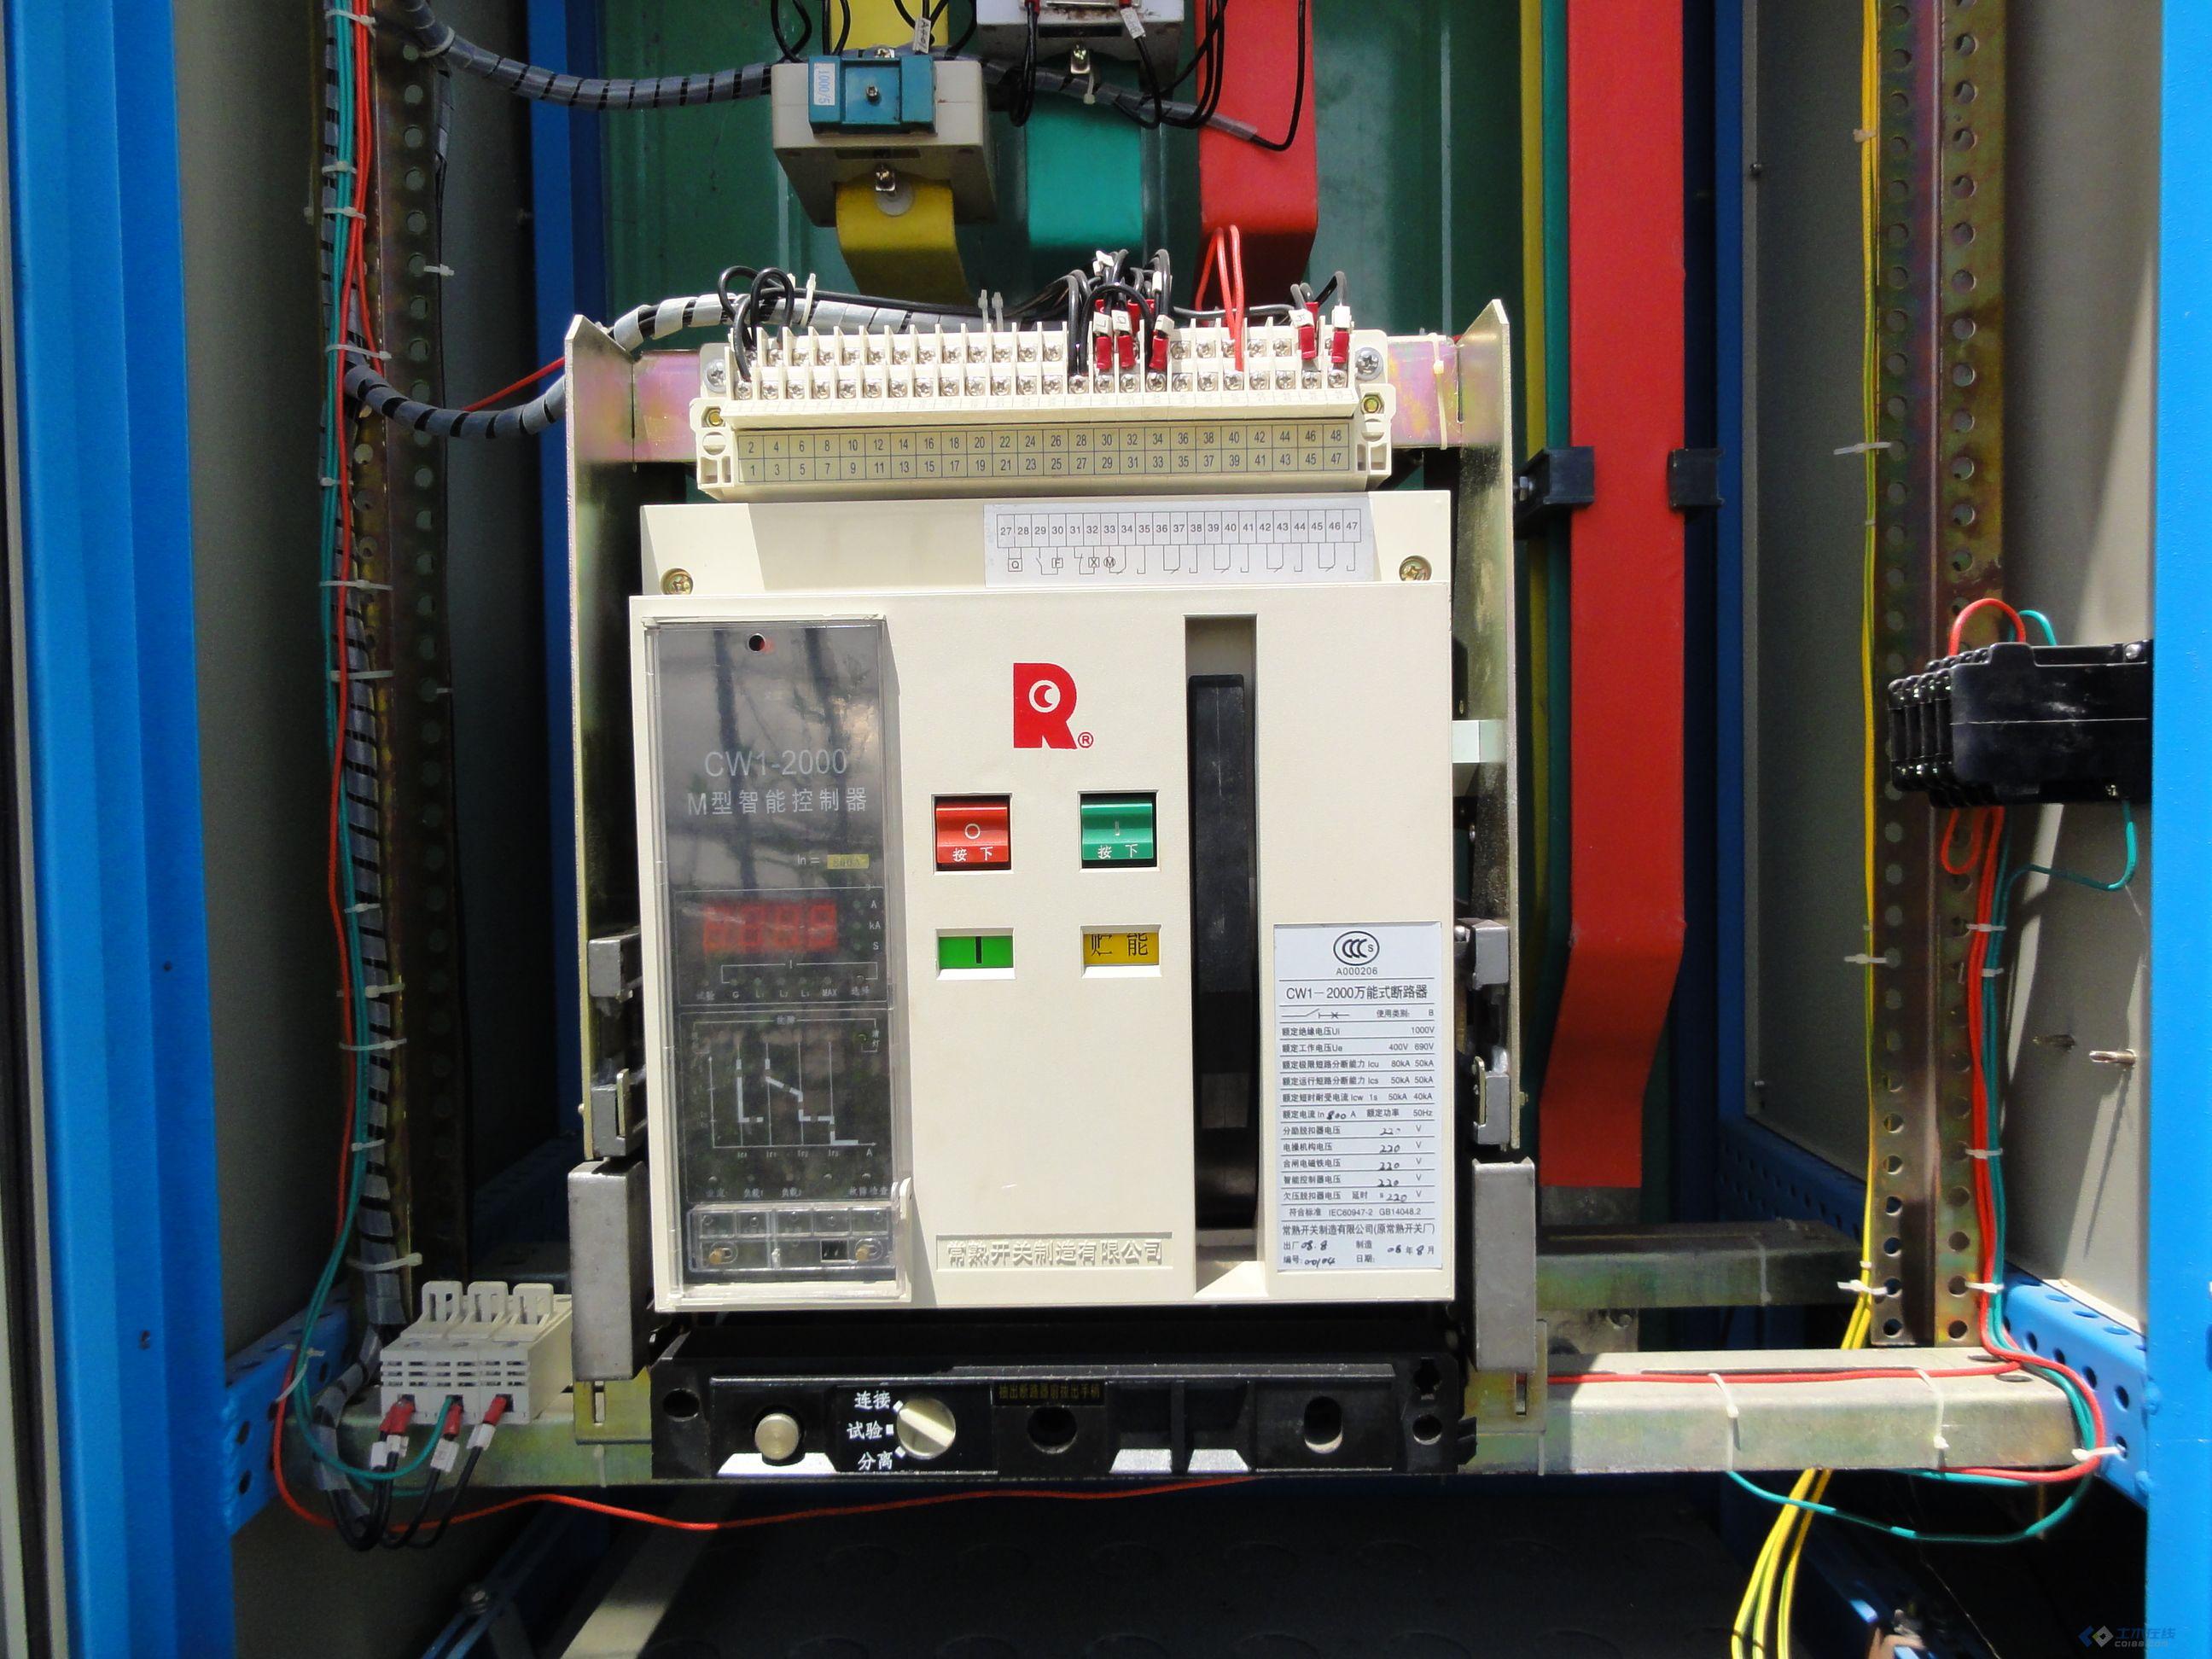 cw1一2000低压智能断路器一次电源侧接线图